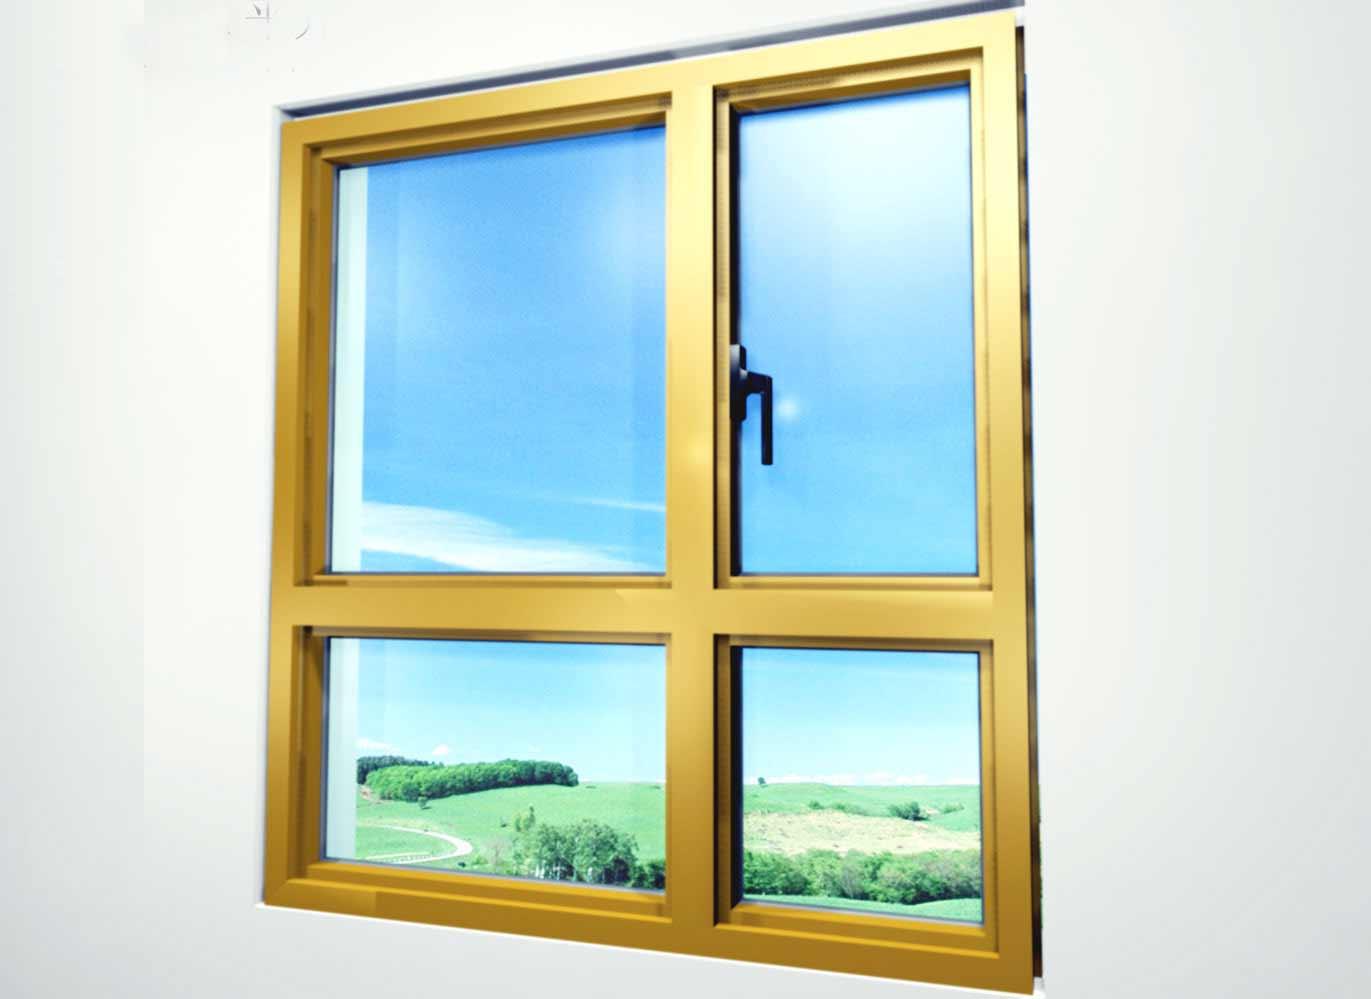 Golden metal awning windows design